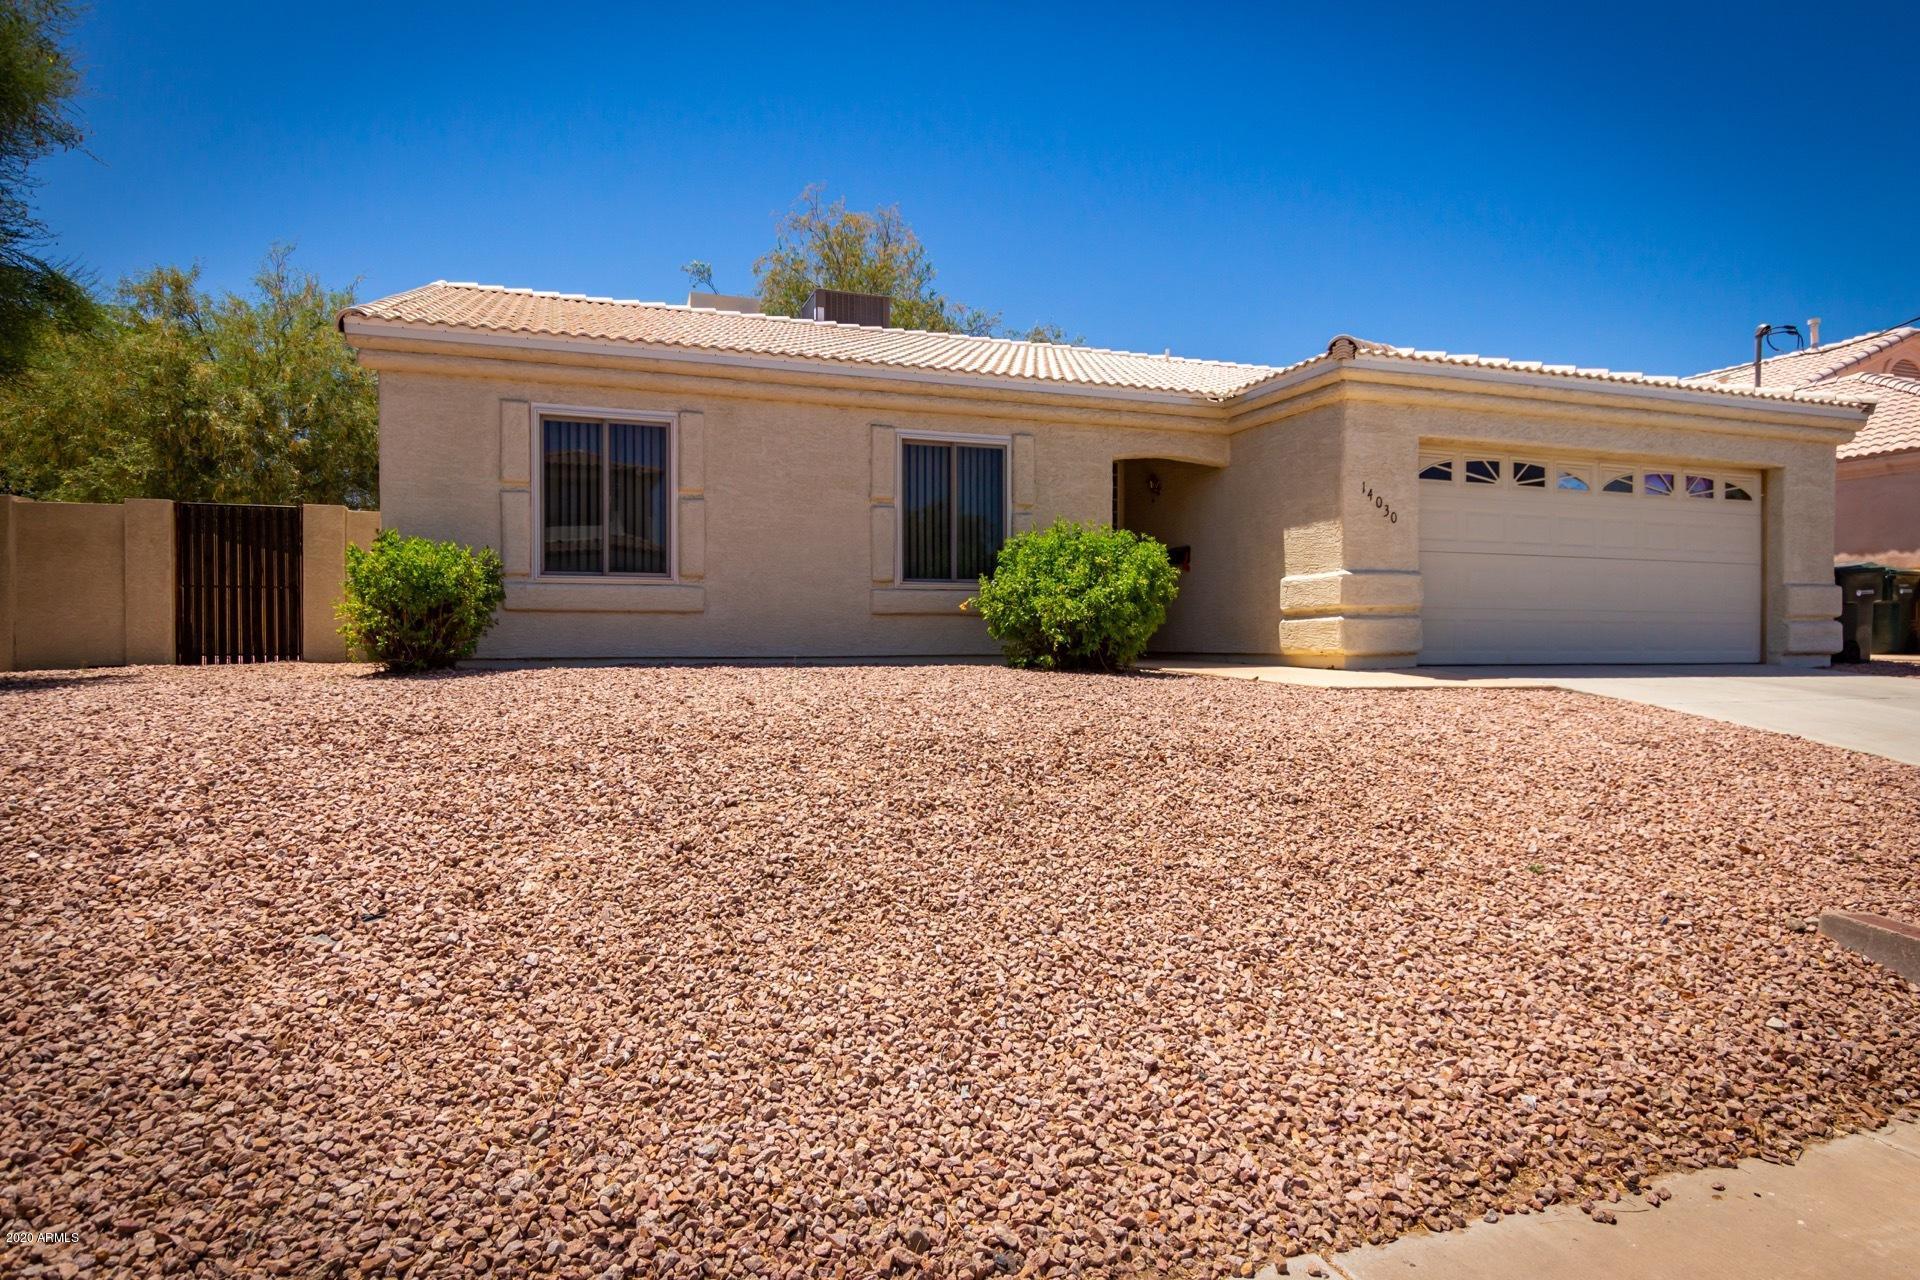 Photo of 14030 N 8TH Place, Phoenix, AZ 85022